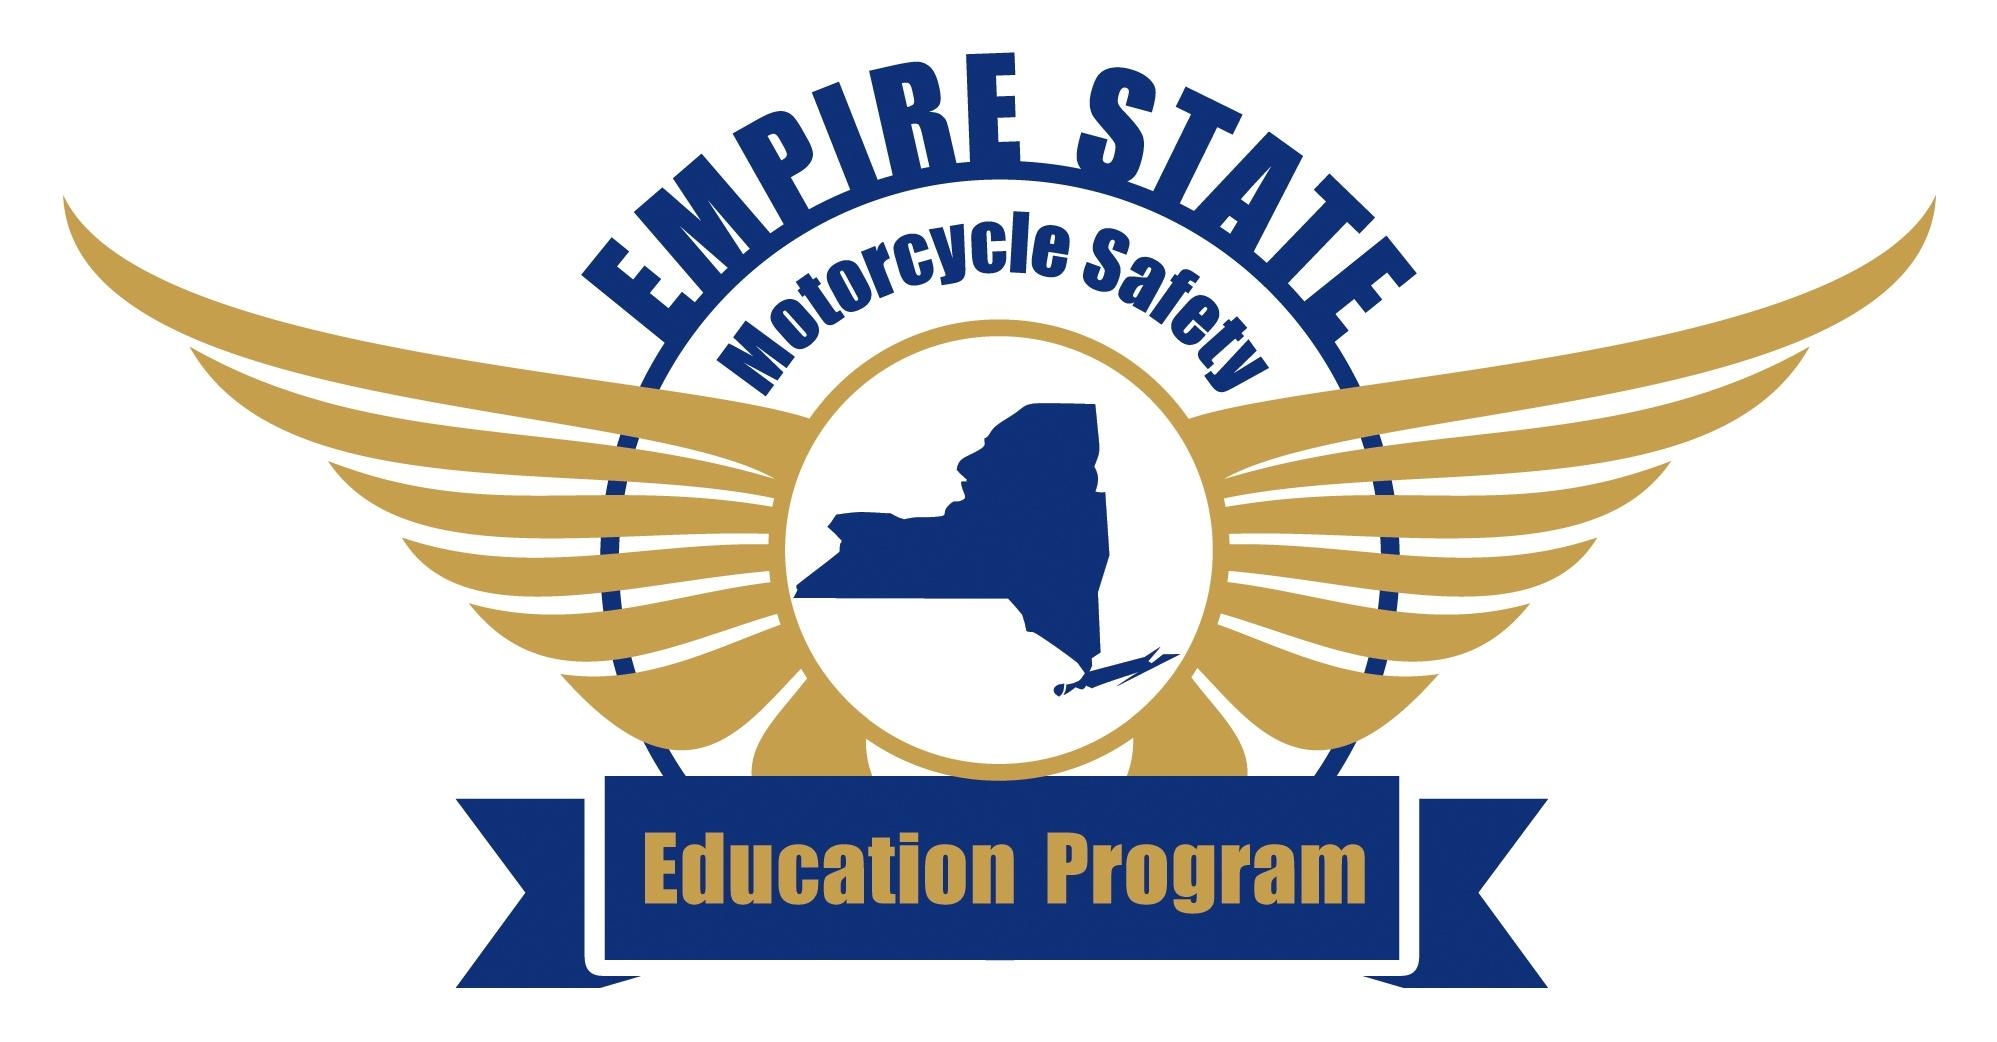 Empire-State-Motorcycle-LOGO-c-Gold.jpg